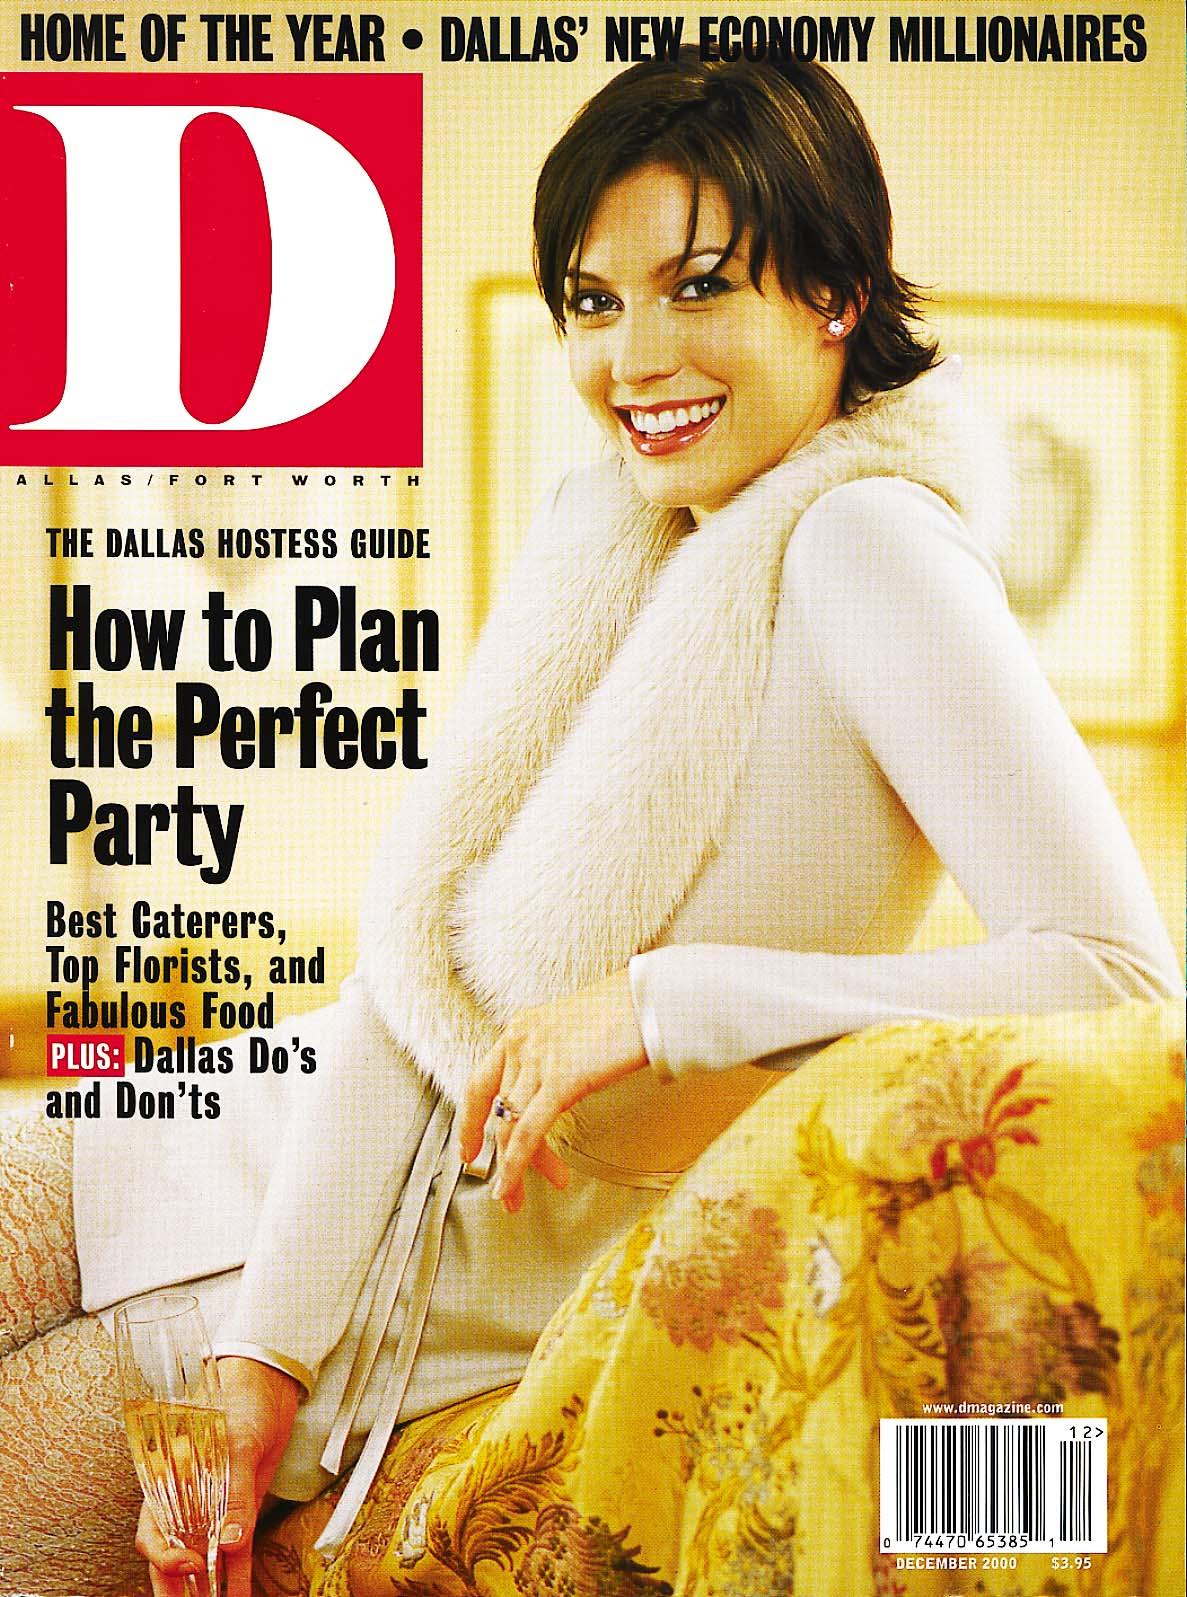 December 2000 cover